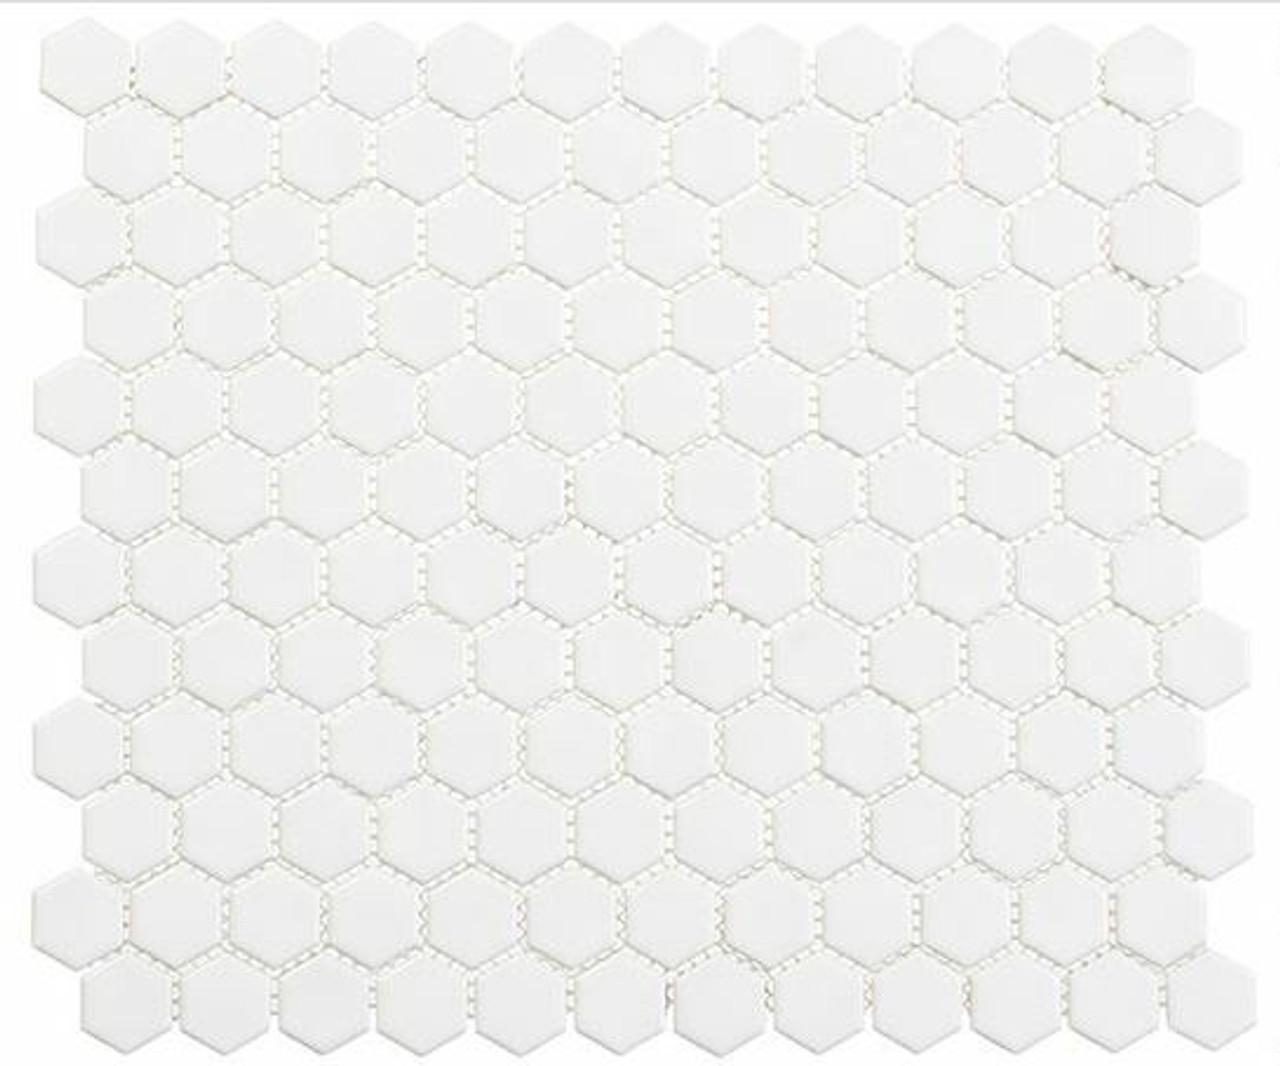 Bella Glass Tiles Freedom Avenue Hexagon Liberty Pure FDM1815